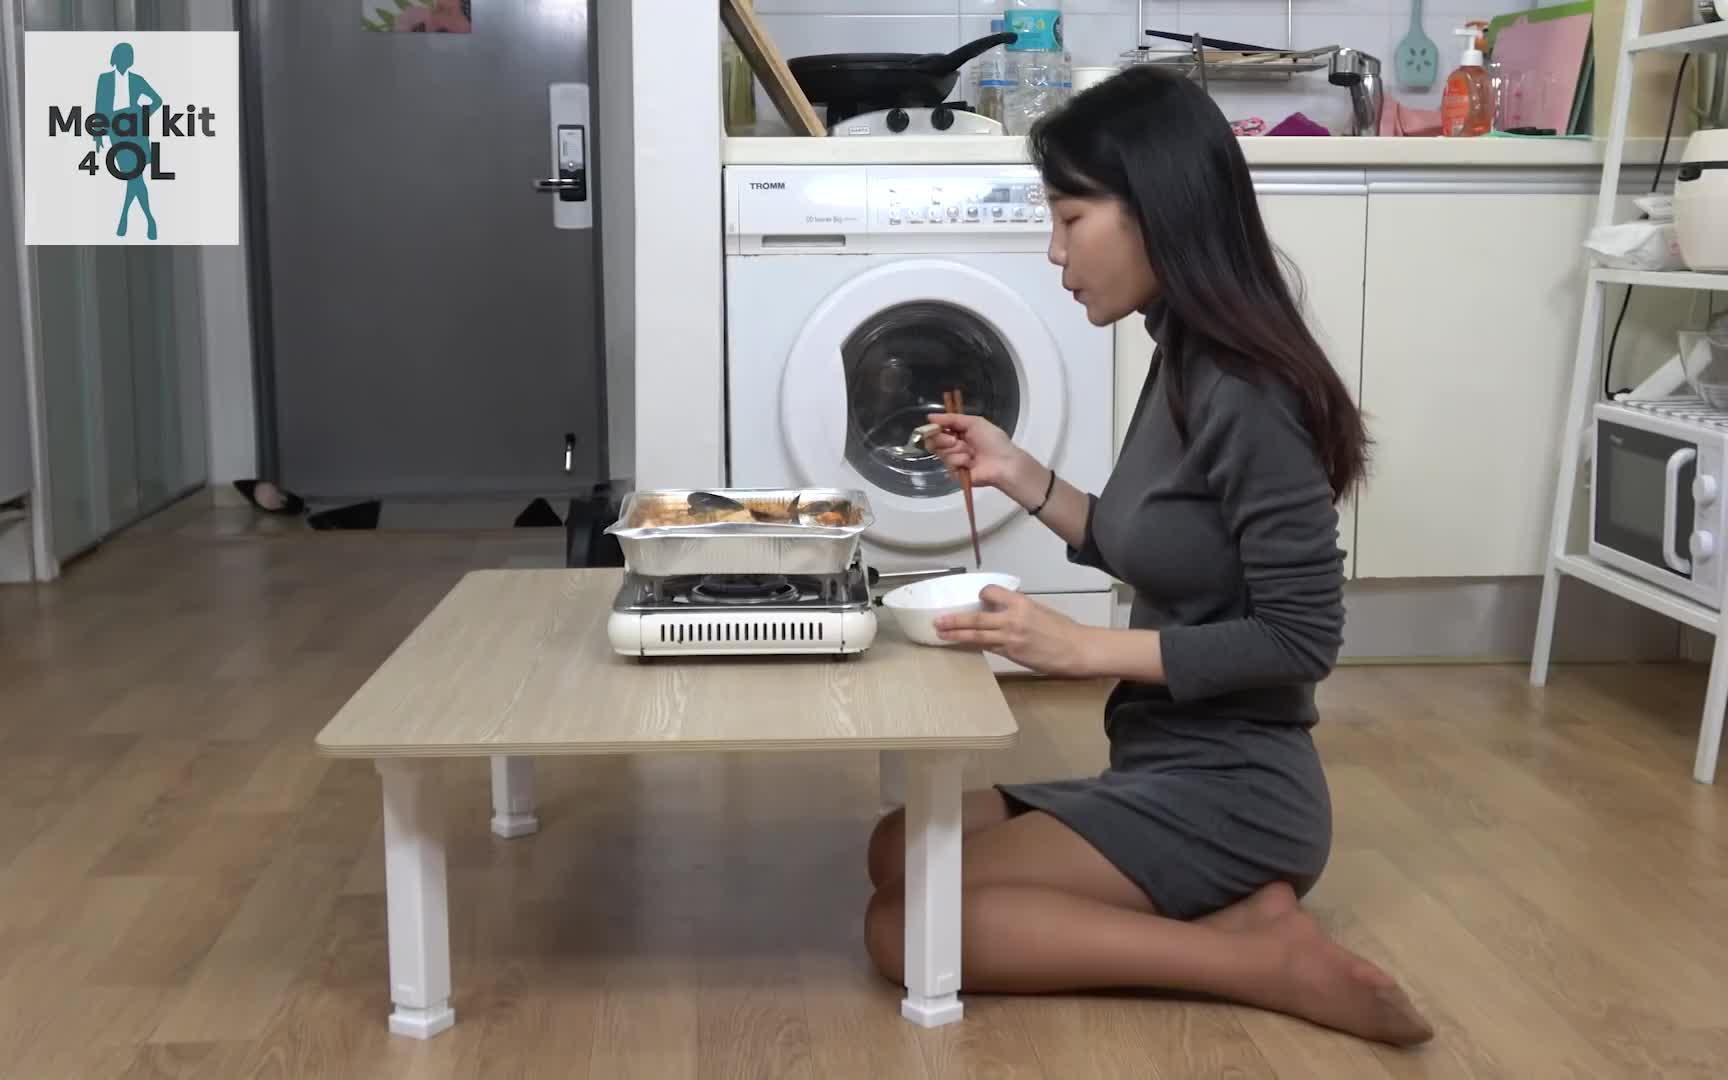 【Mealkit 4 OL】速食广告 -和OL秀珍一起唱歌喝烧酒!!